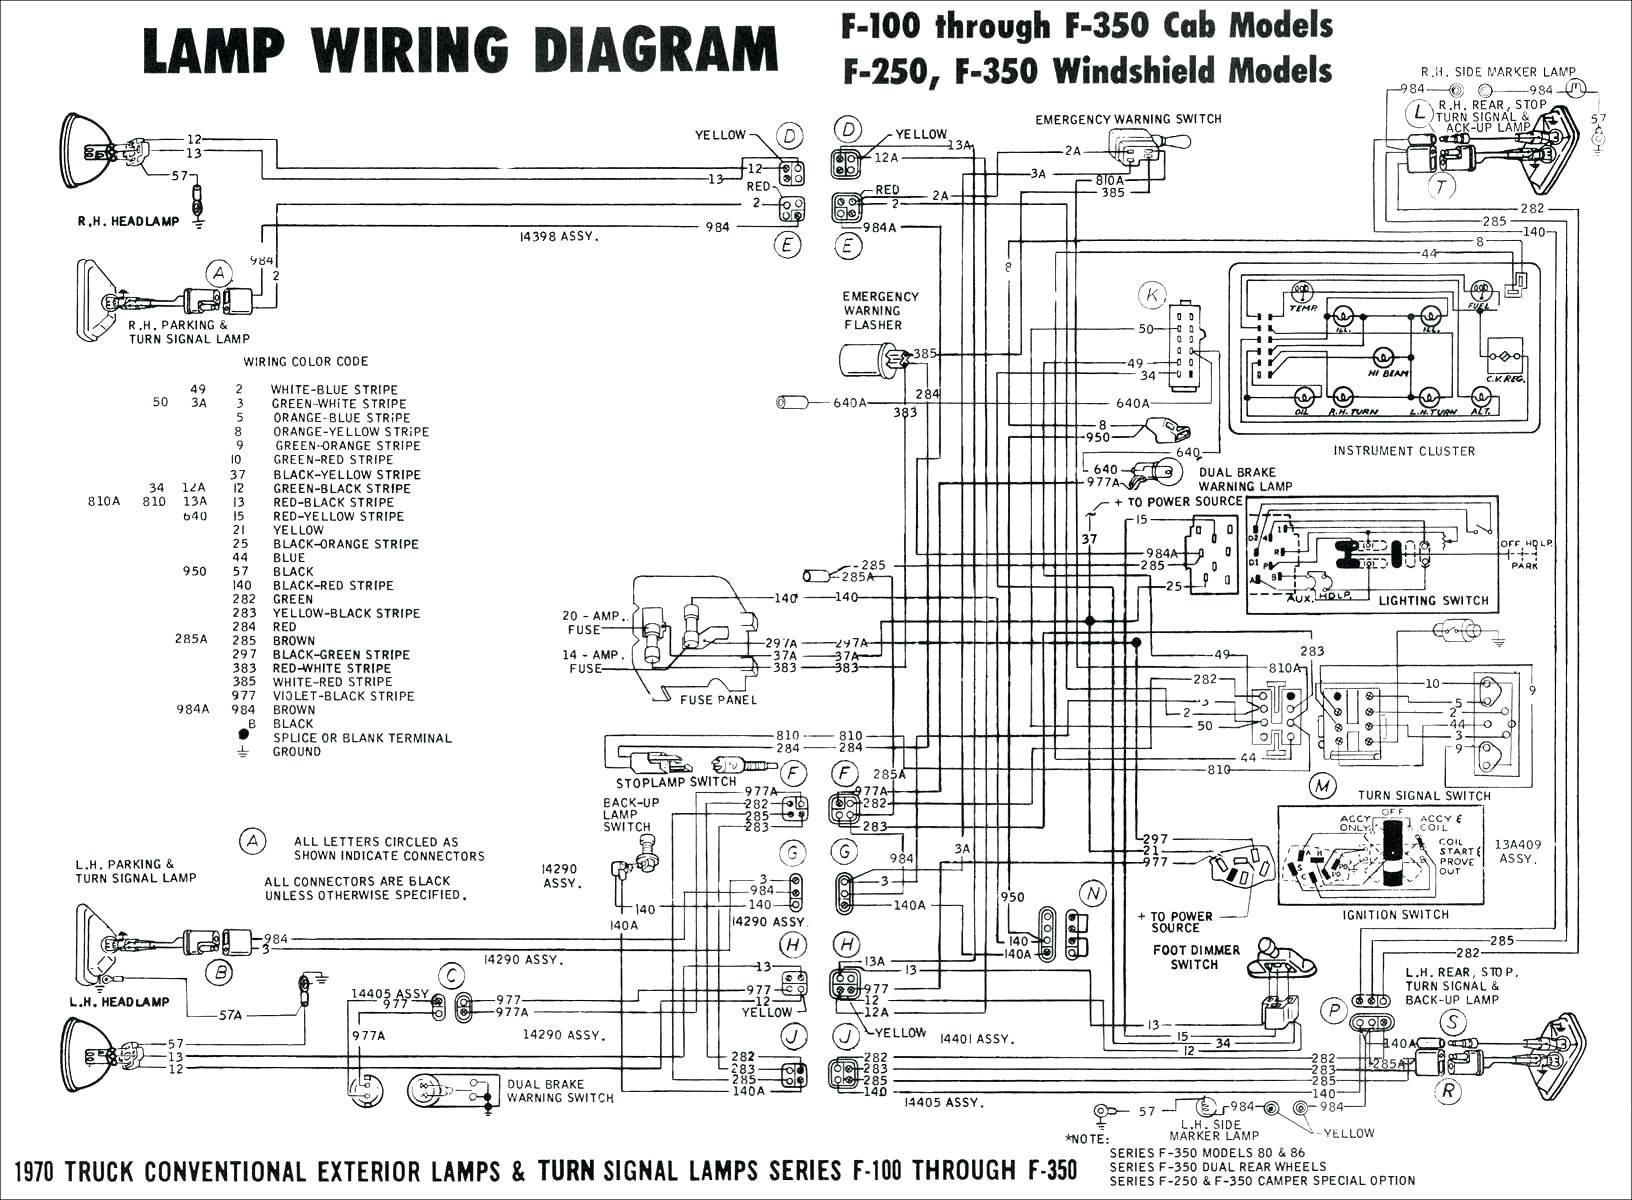 1966 Mustang Wiring Diagram Mustang Alternator Wiring Diagram Besides ford F650 Turn Signal Of 1966 Mustang Wiring Diagram